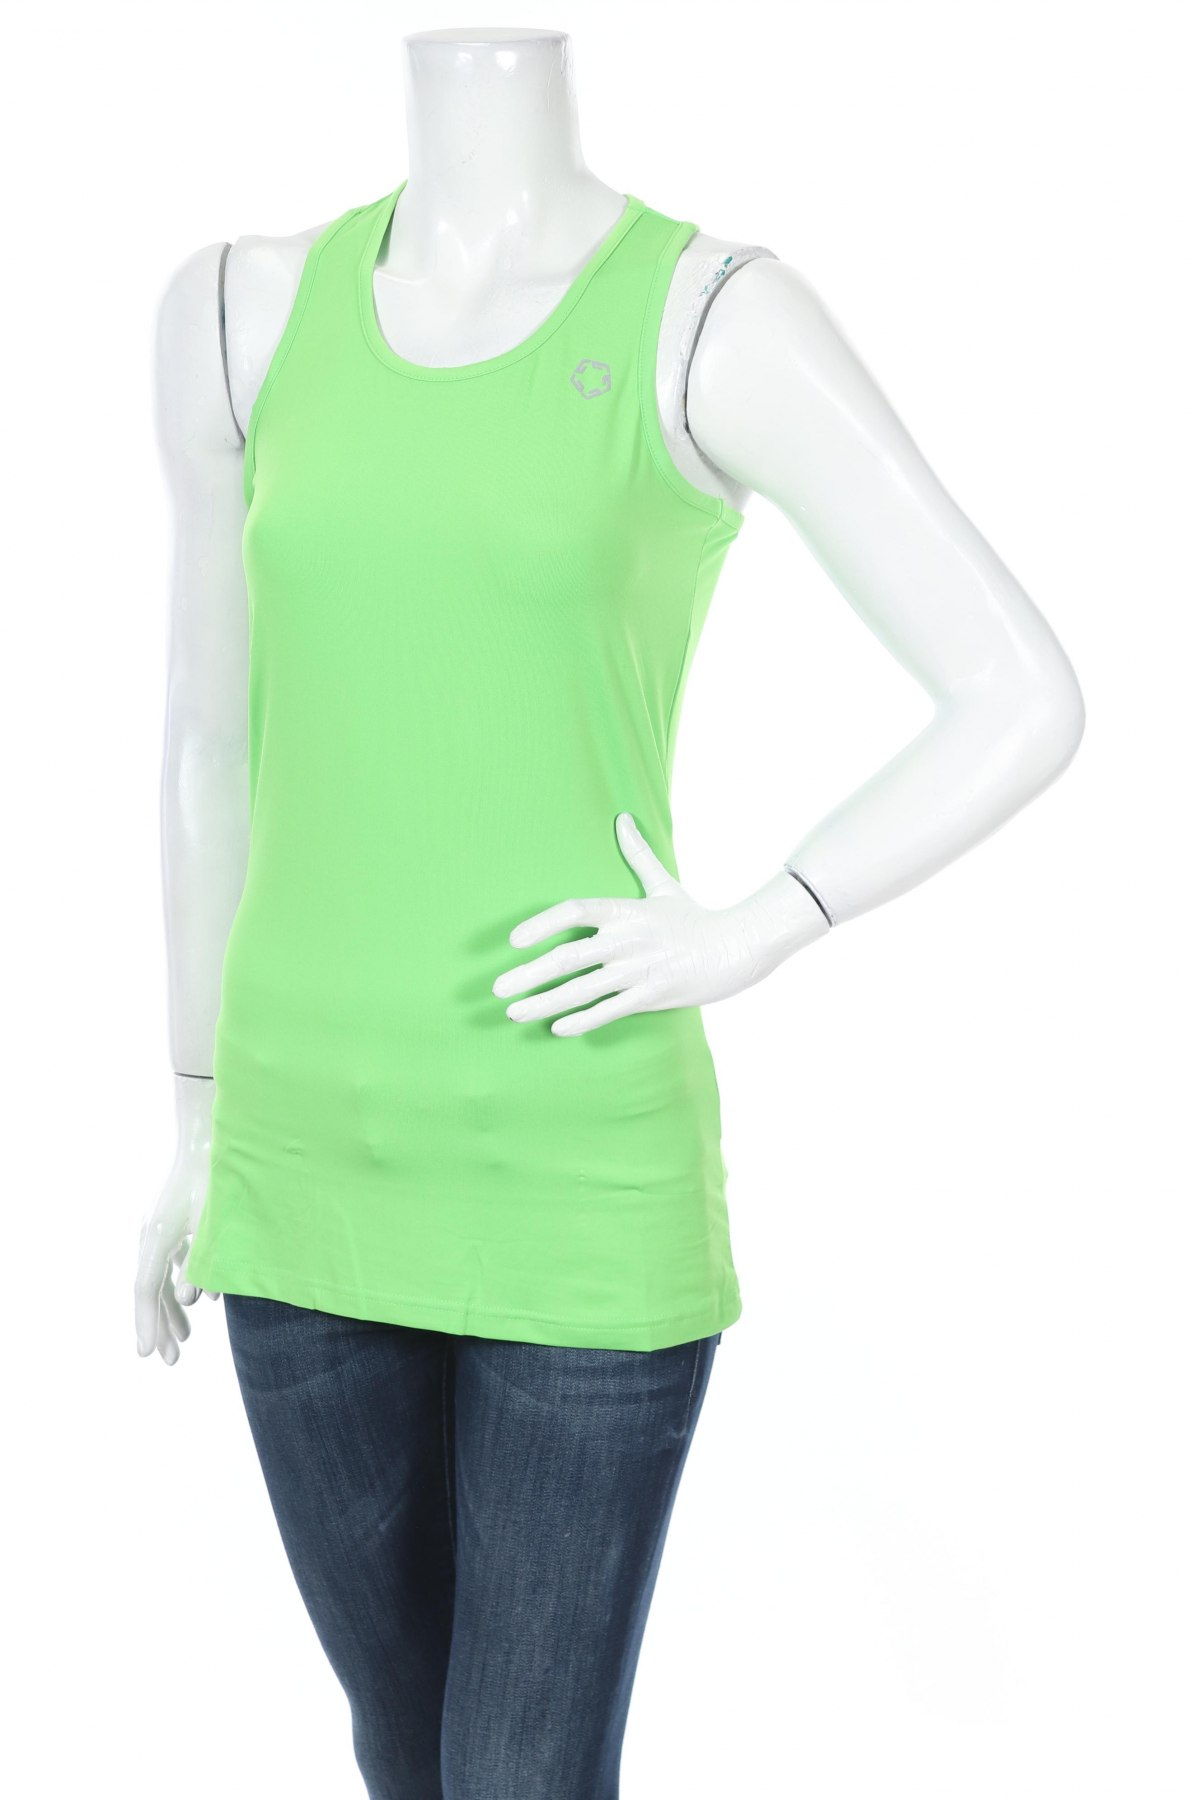 Дамски потник Gregster, Размер M, Цвят Зелен, 88% полиестер, 12% еластан, Цена 23,40лв.